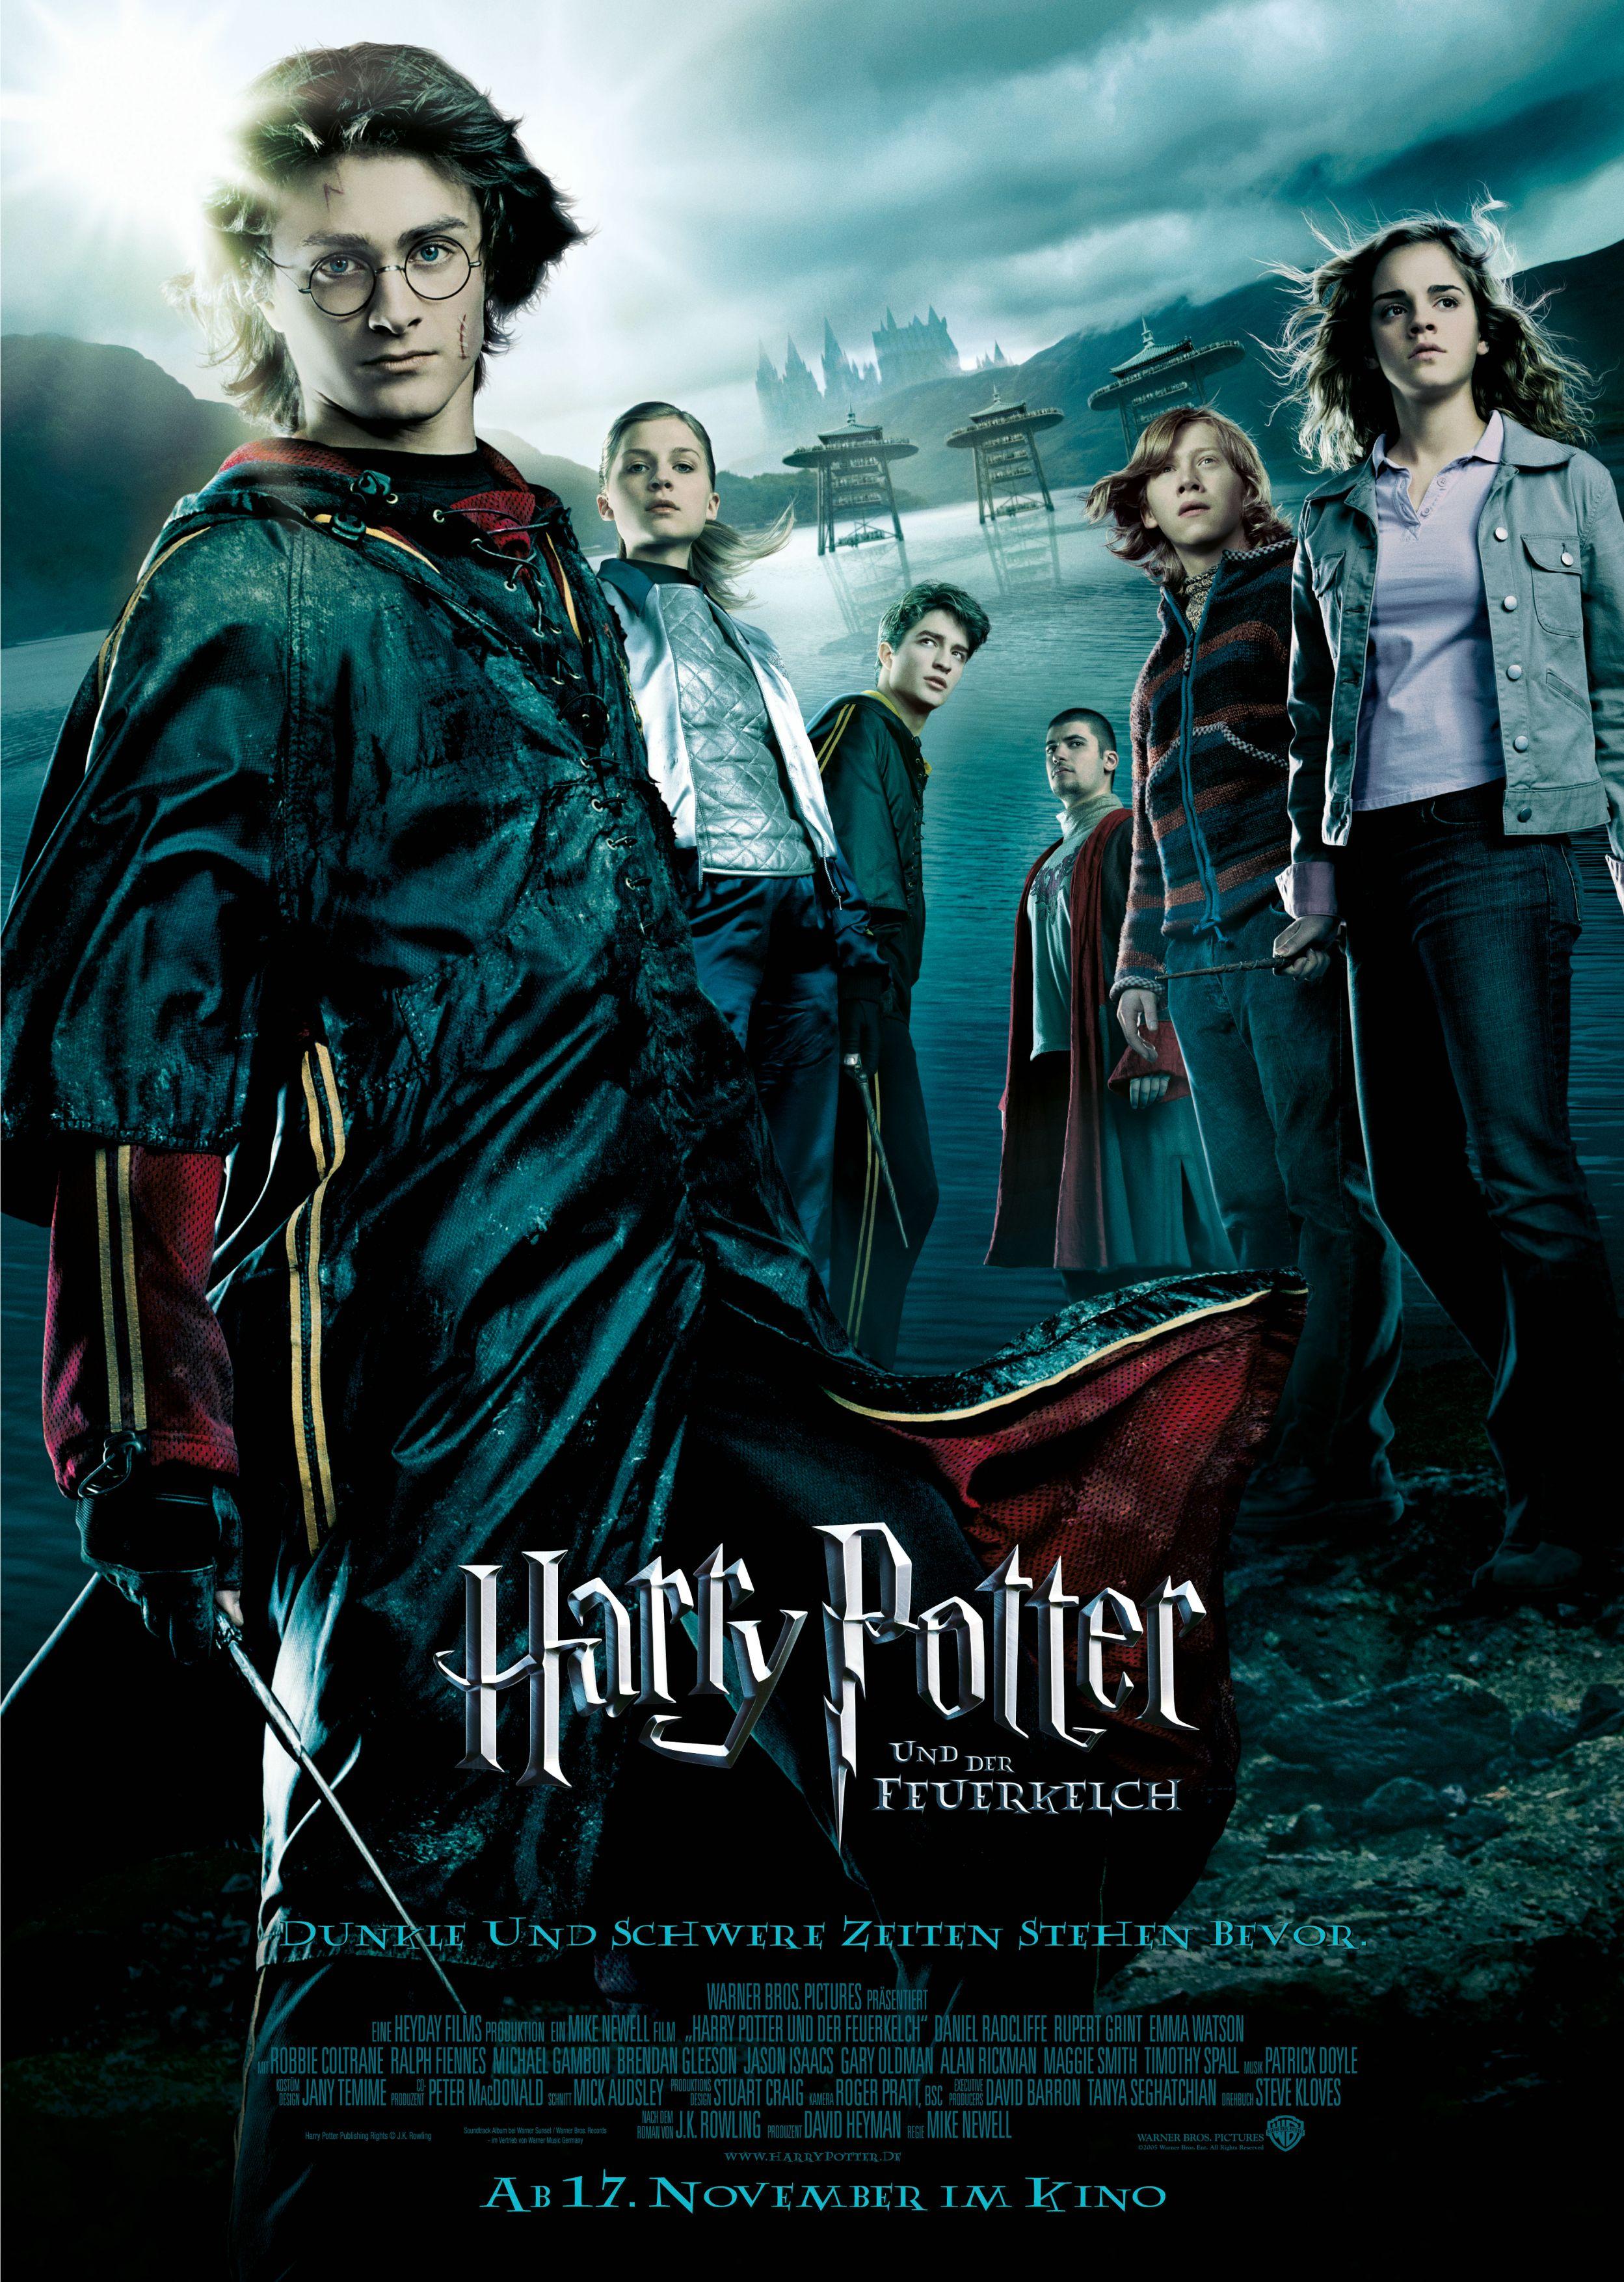 Pin By Jane Smith On Harry Potter Harry Potter Goblet Harry Potter Movie Posters Harry Potter Movies